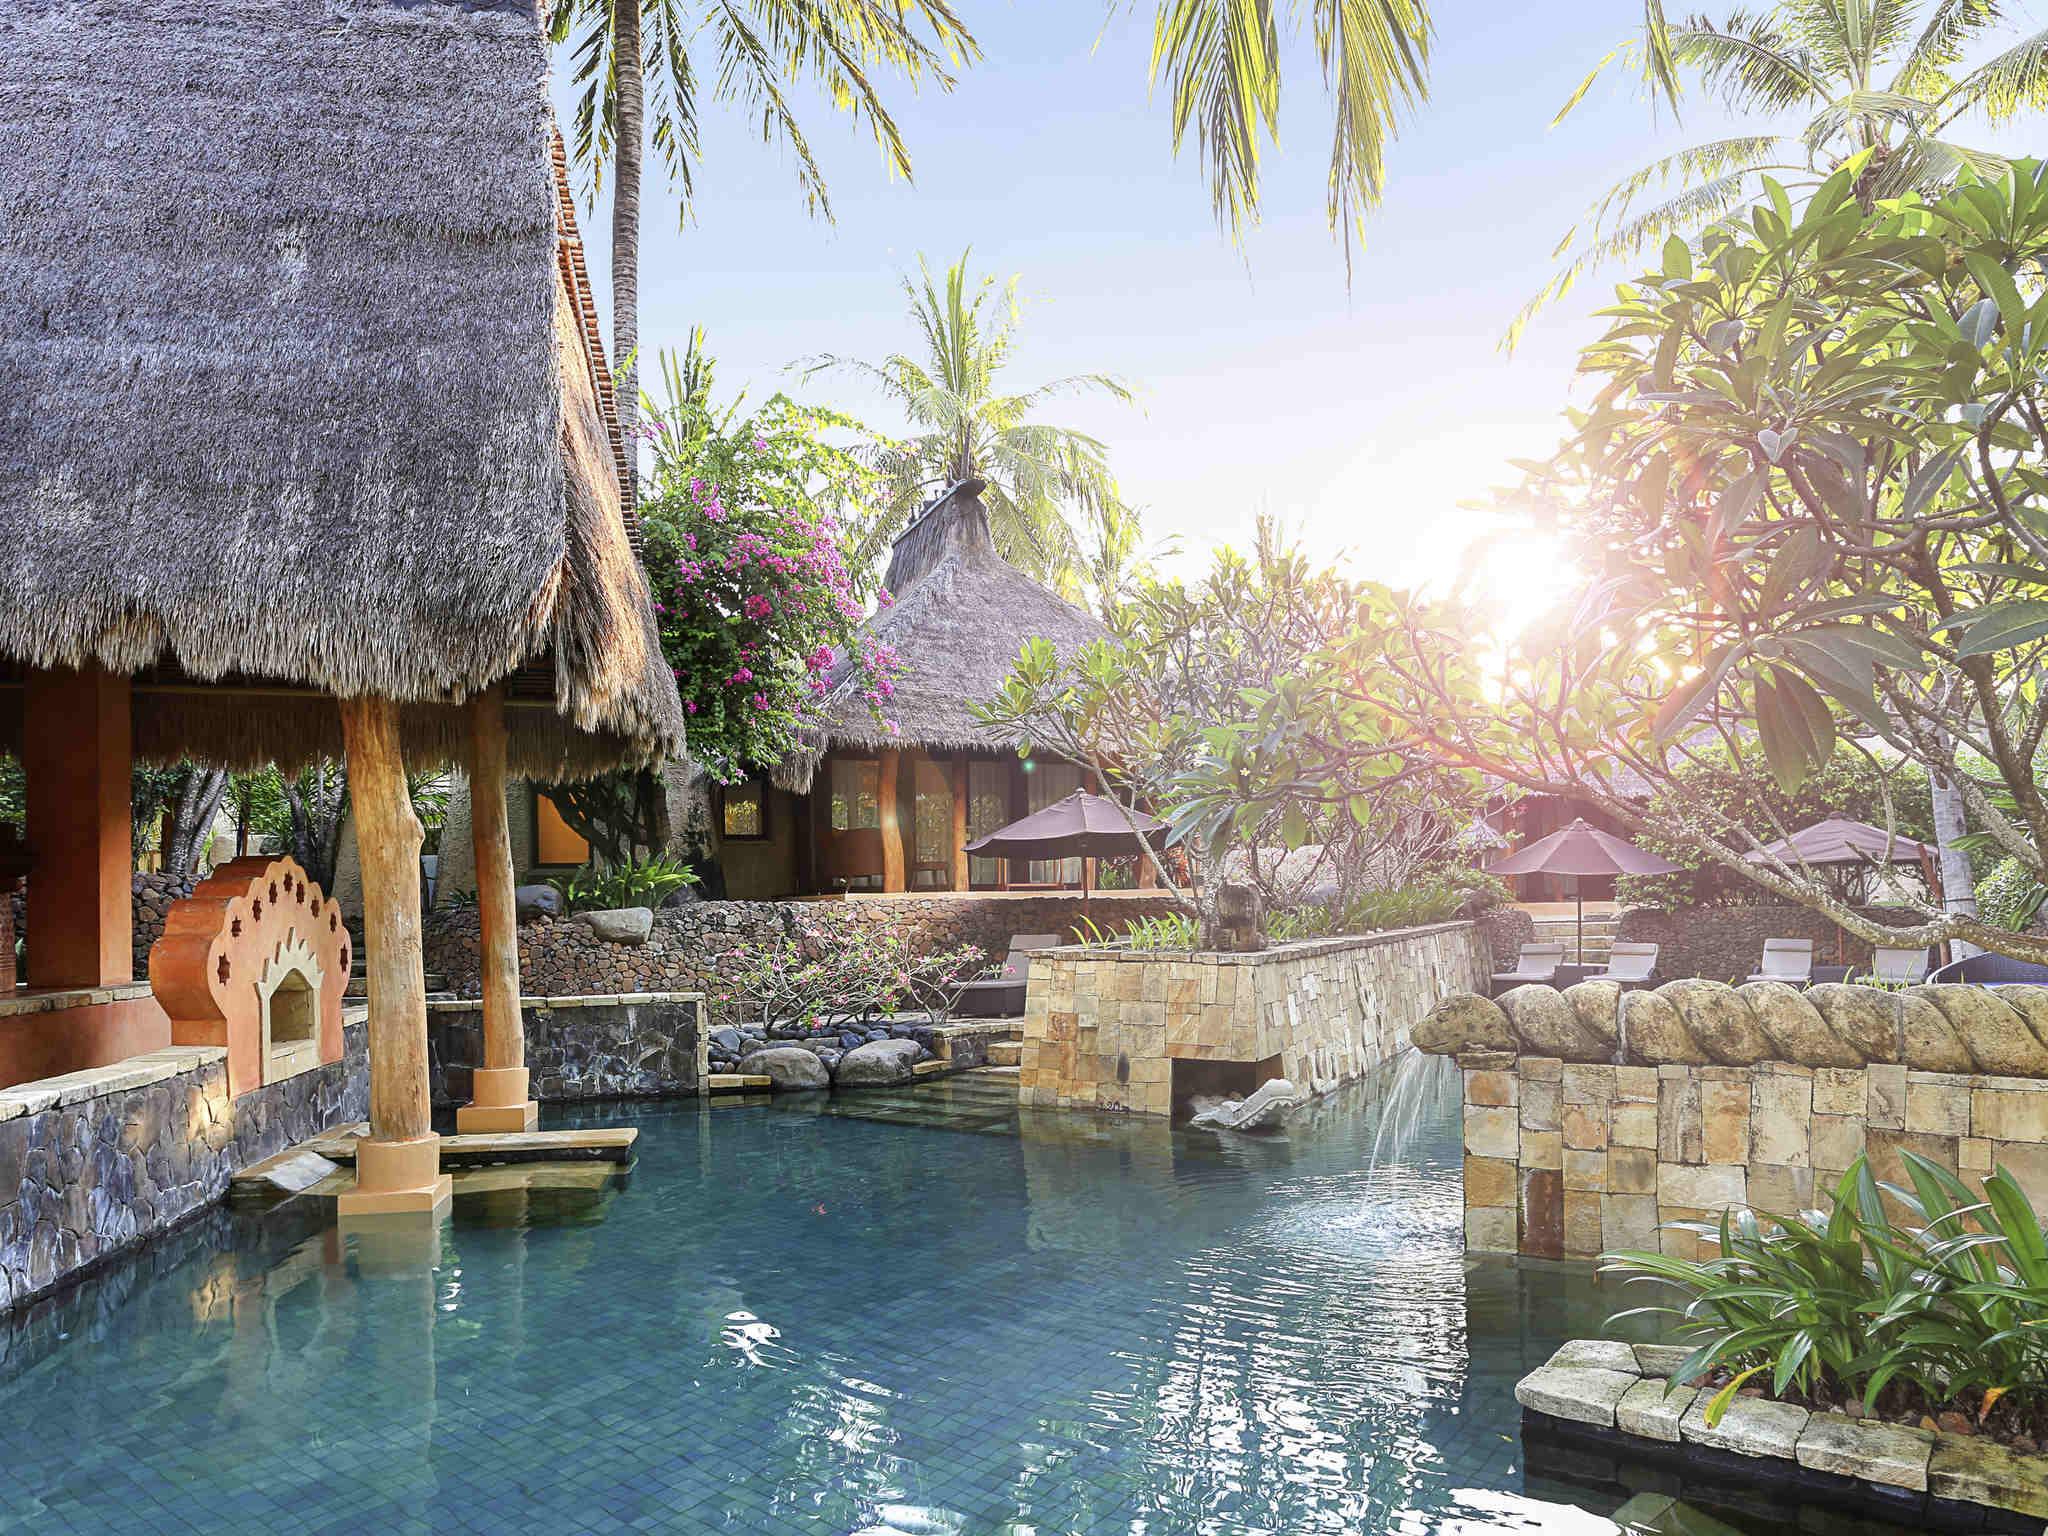 novotel lombok resort and villas luxury hotel accorhotels rh accorhotels com hotel di lombok tengah dekat pantai hotel baru di lombok tengah